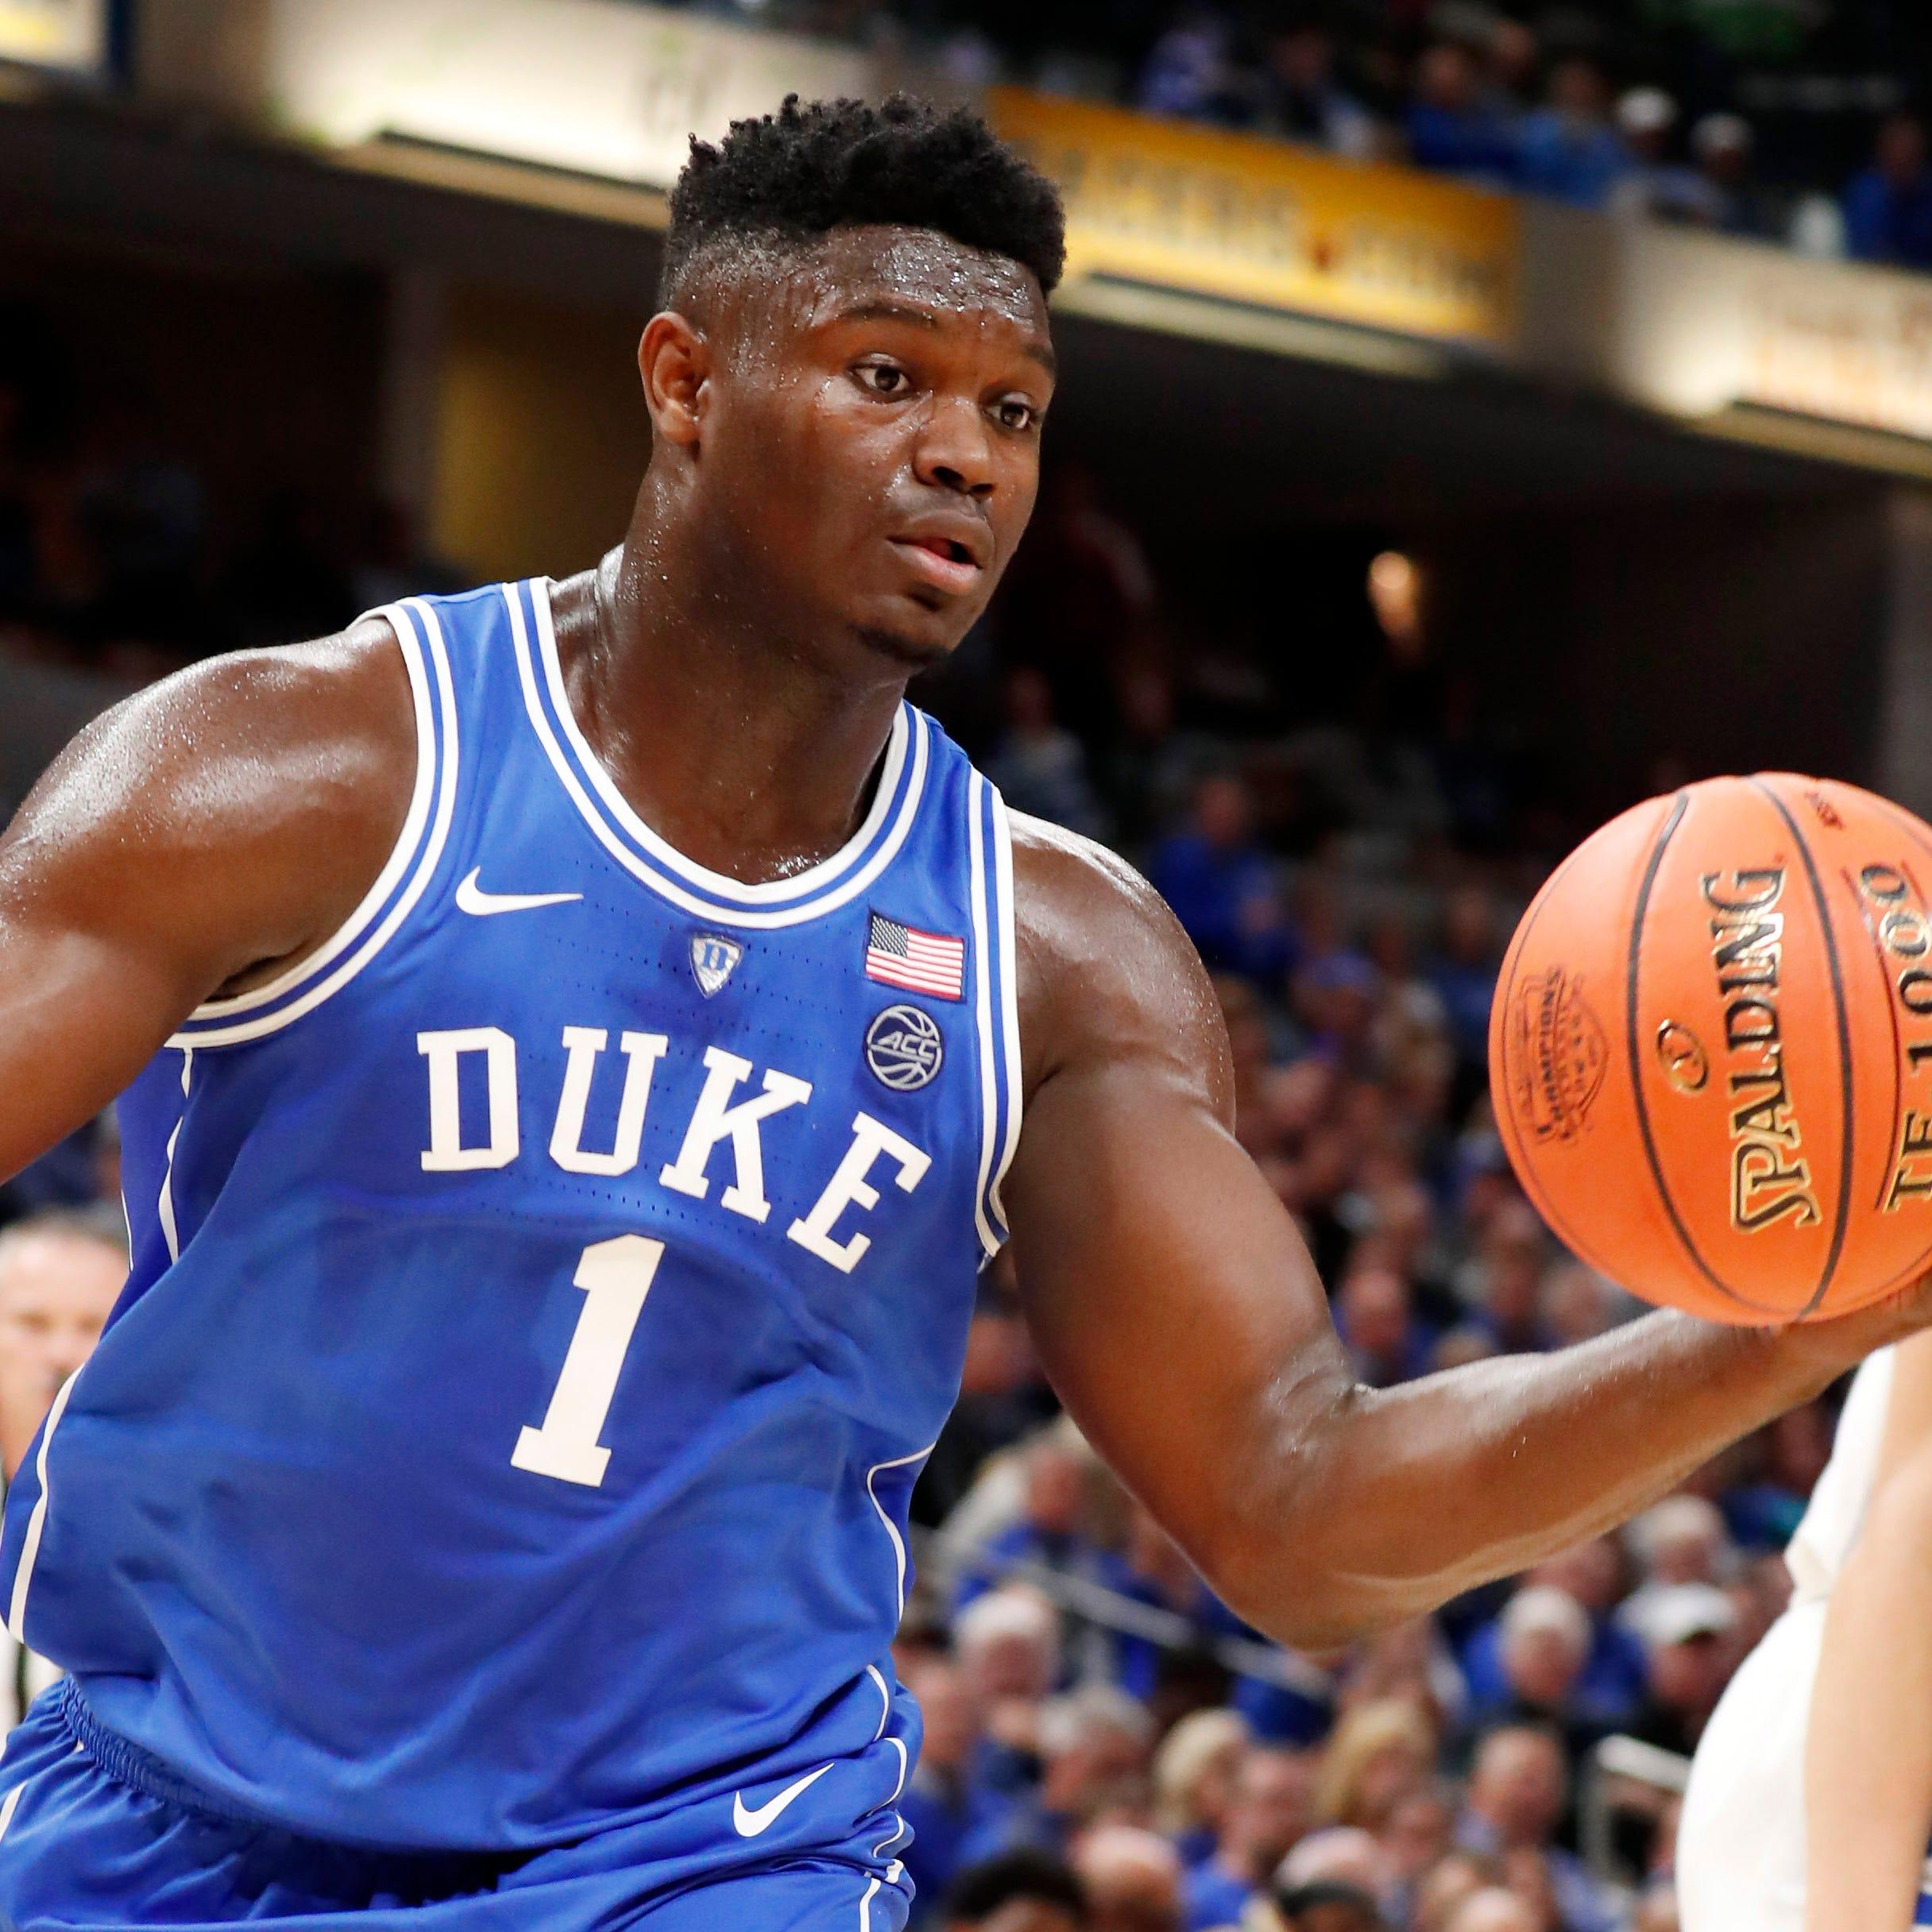 Doyel: Meet Duke phenom Zion Williamson, the most unique college basketball player I've ever seen